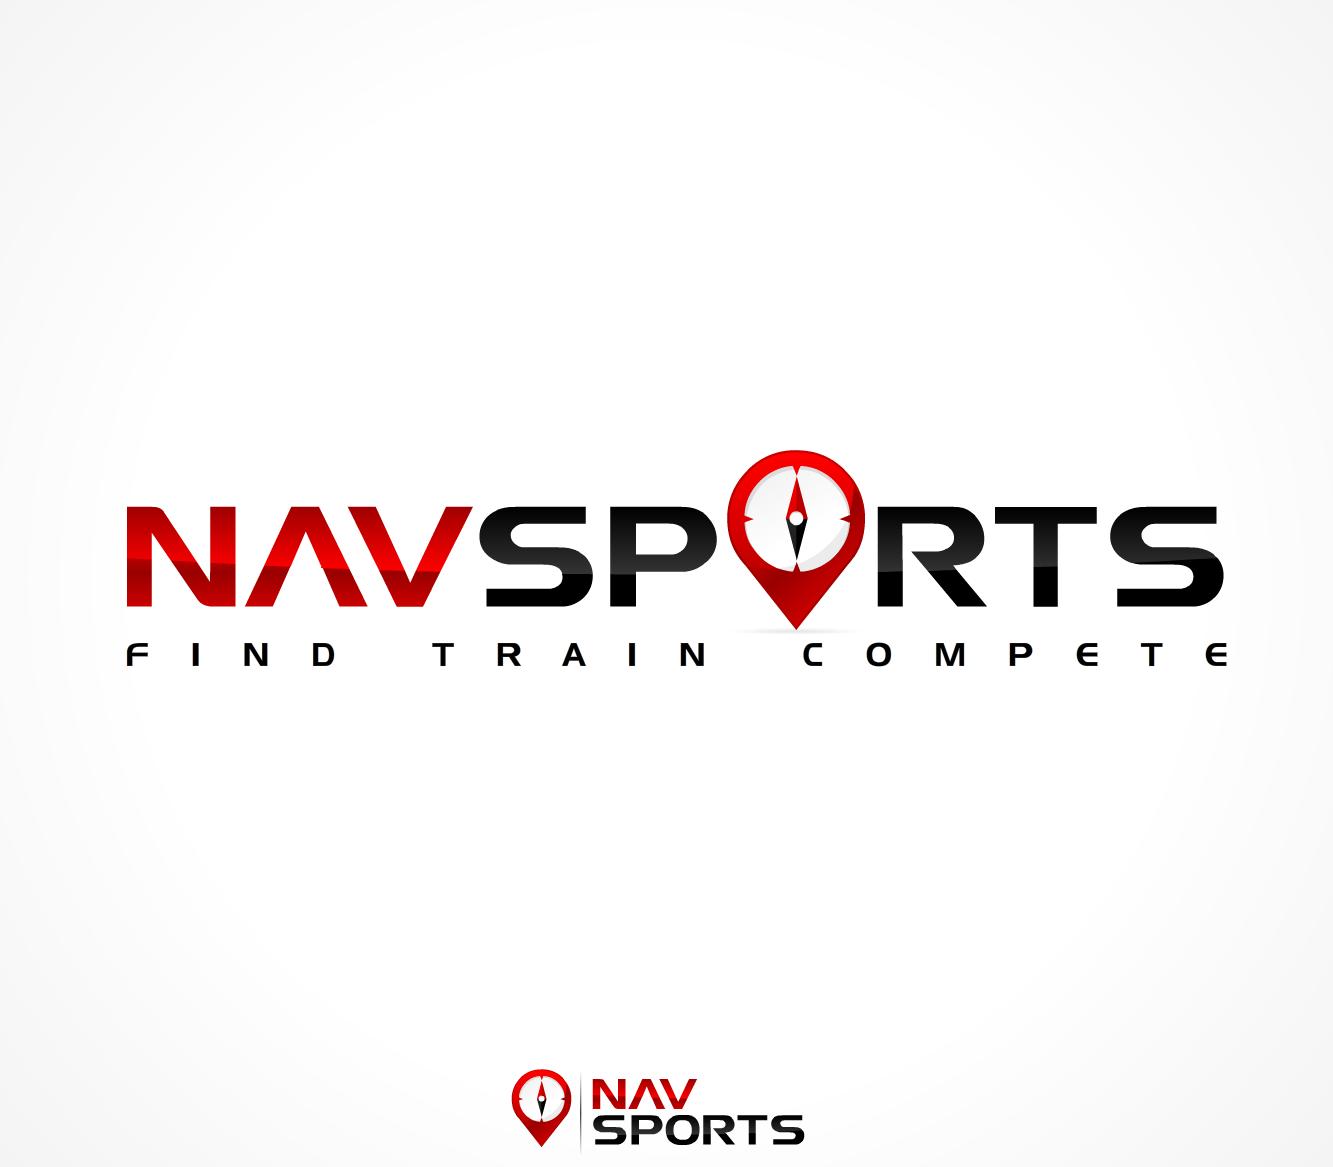 Create the next logo for NavSports